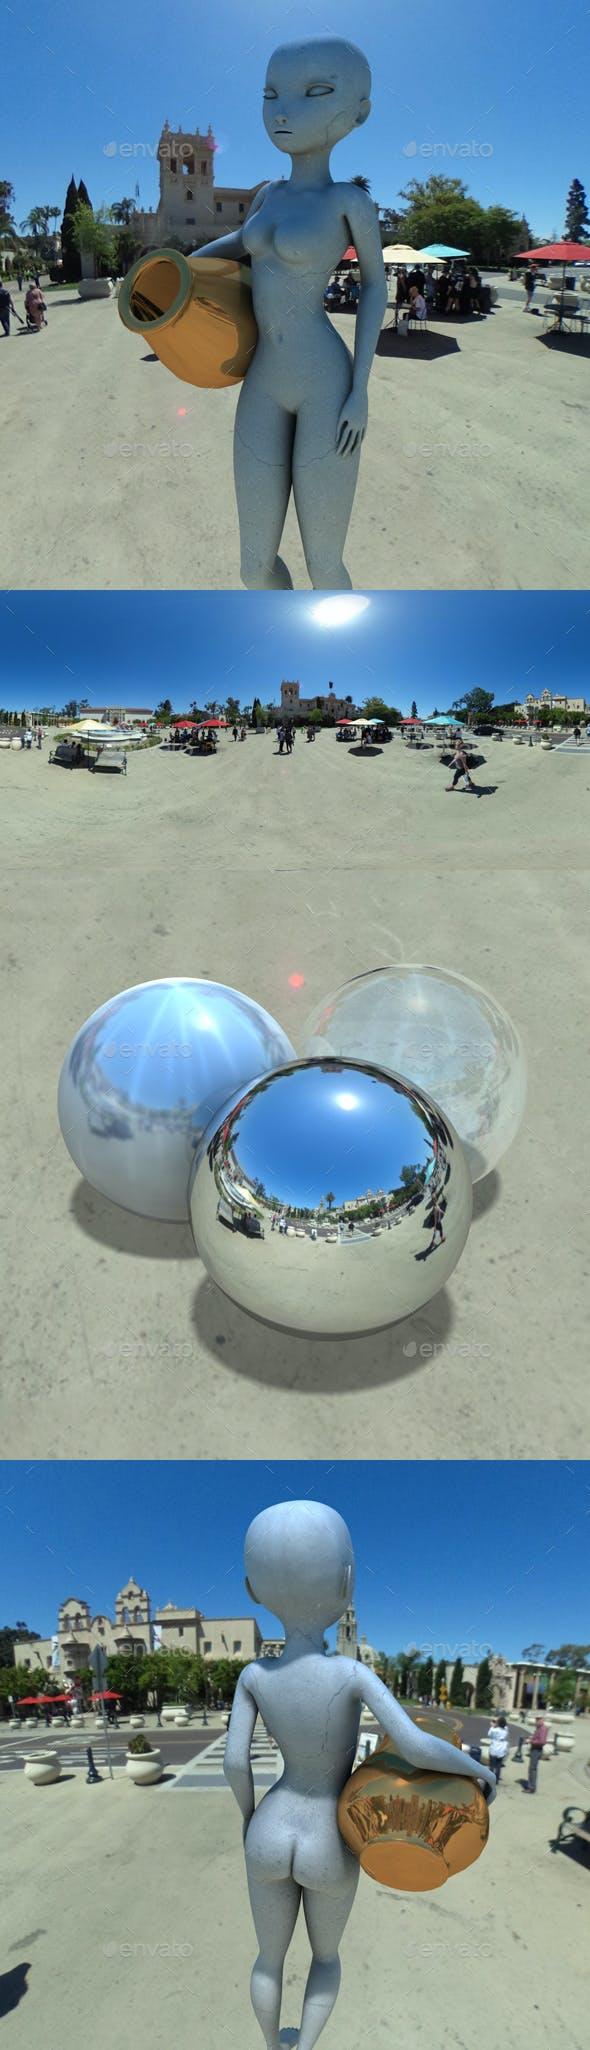 San Diego Balboa Park HDRI - 3DOcean Item for Sale